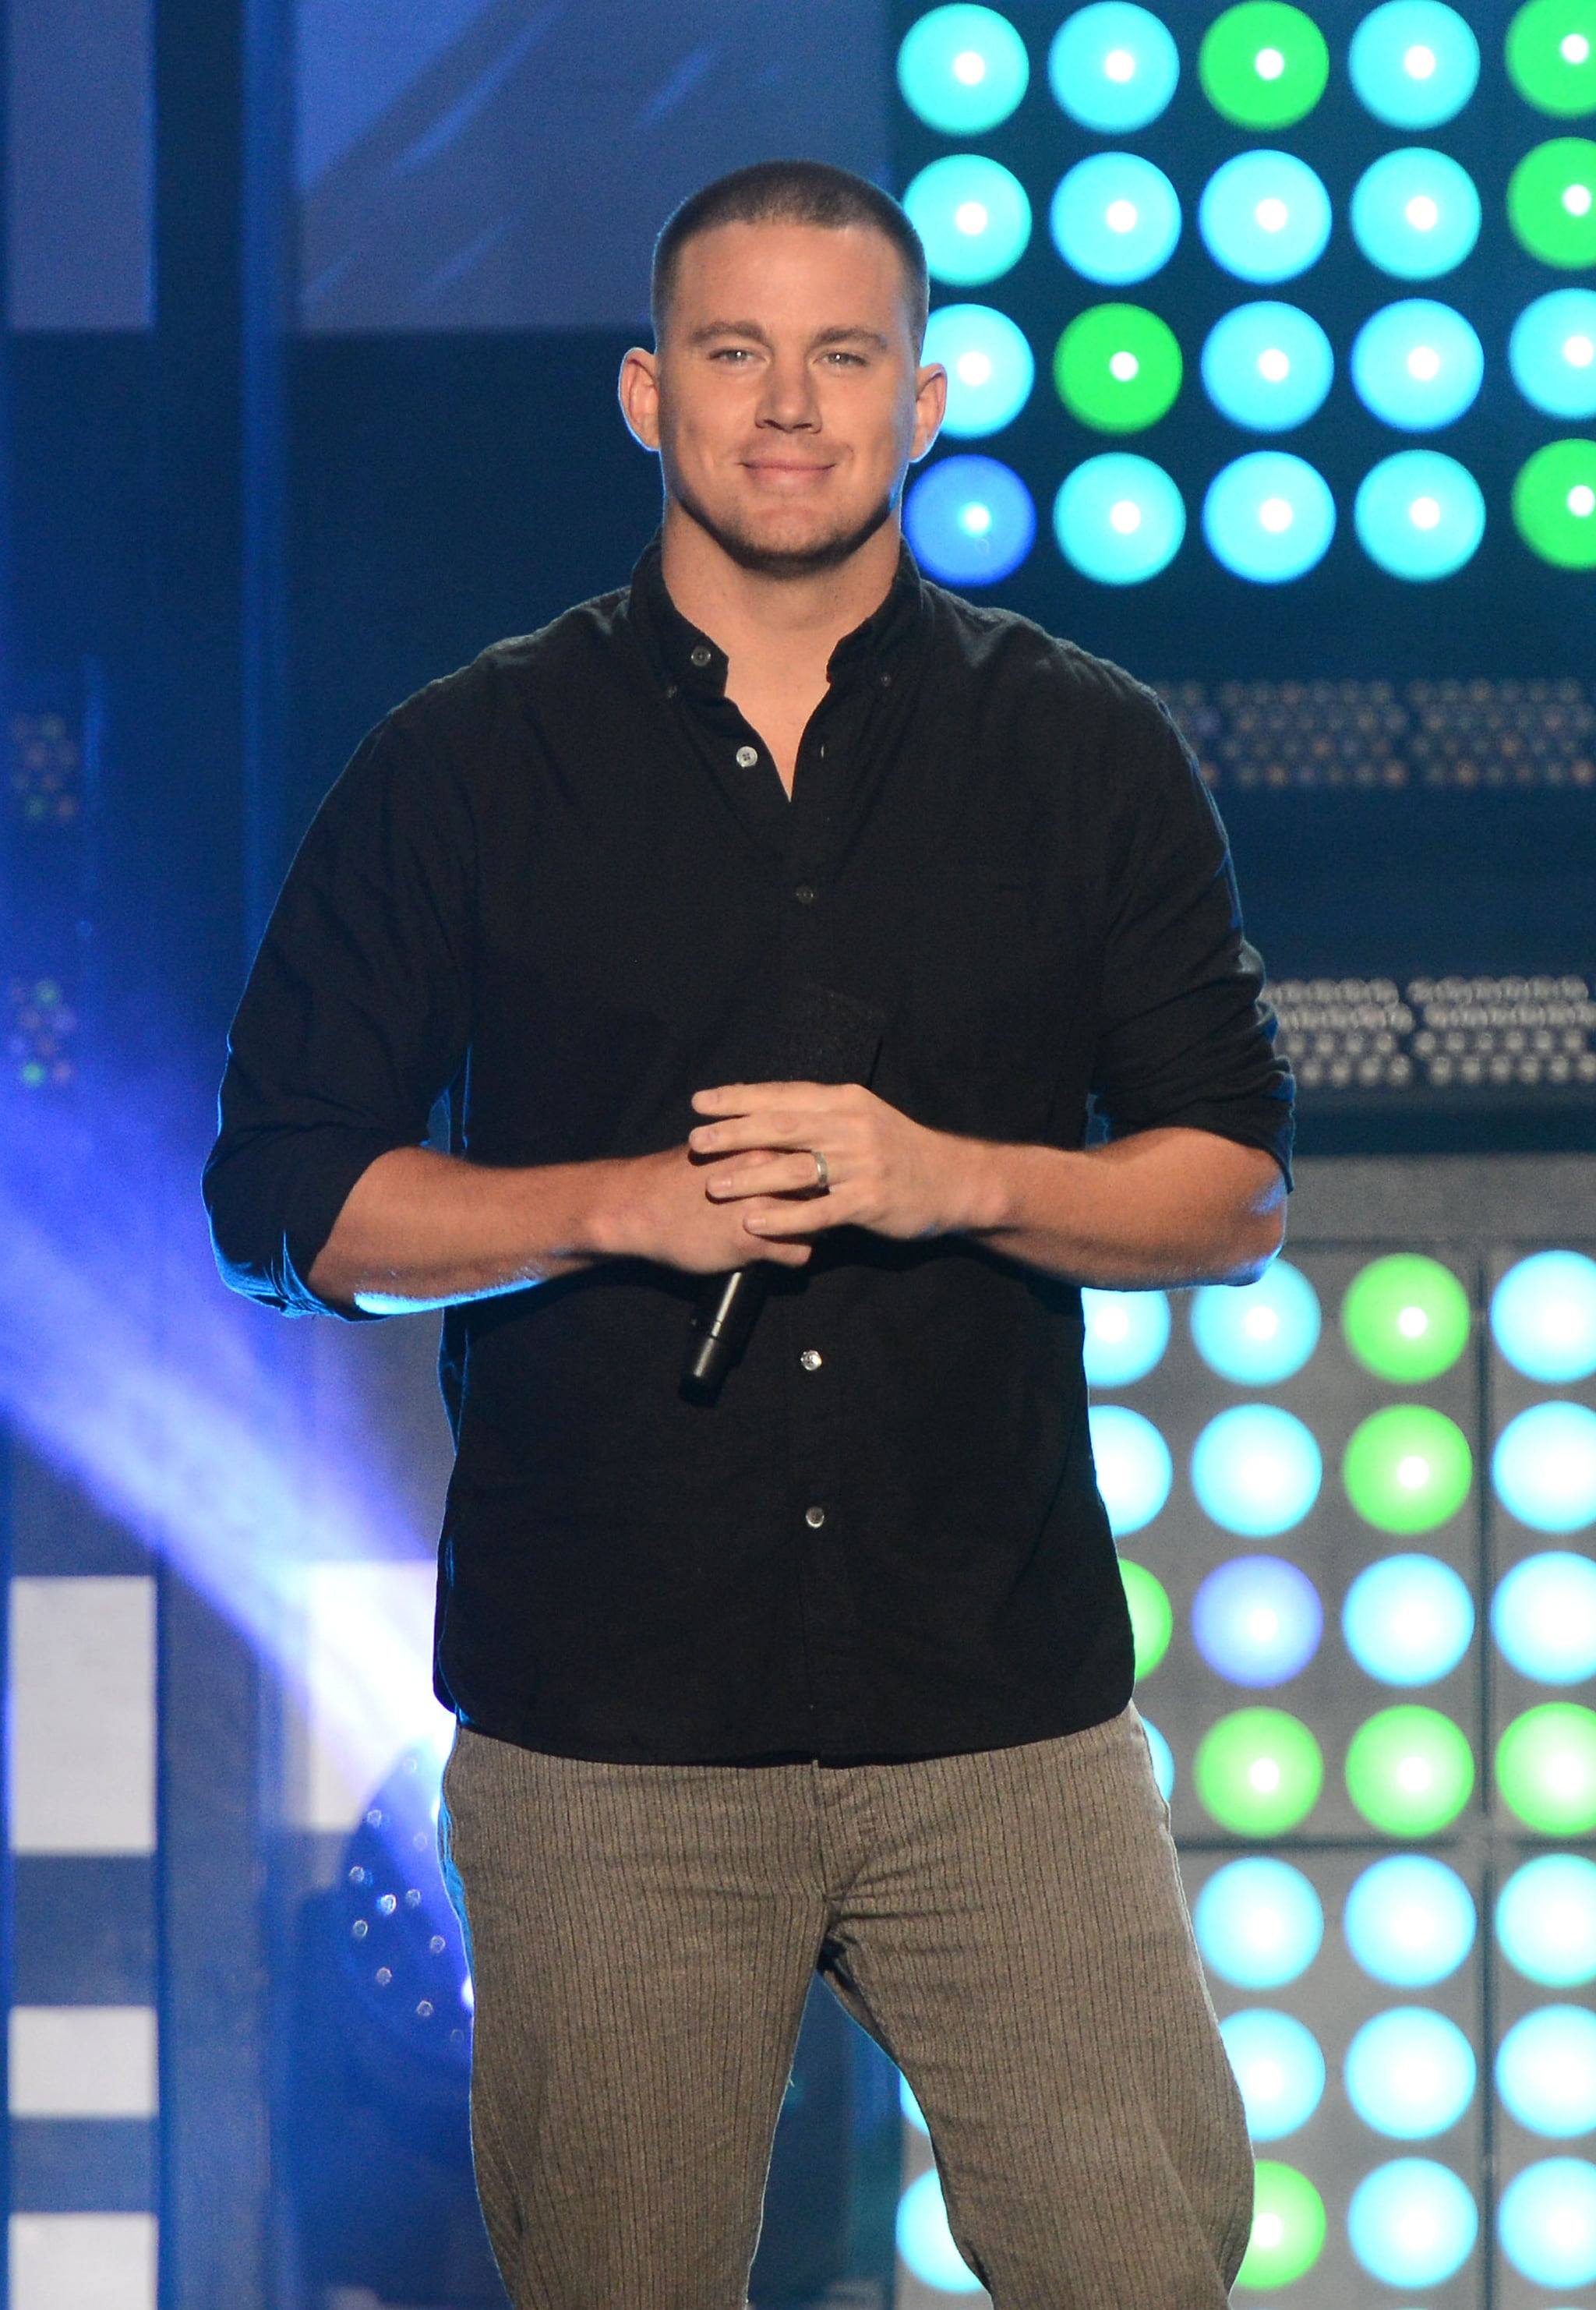 Channing Tatum smirked on stage at the MTVu Fandom Awards on Thursday.